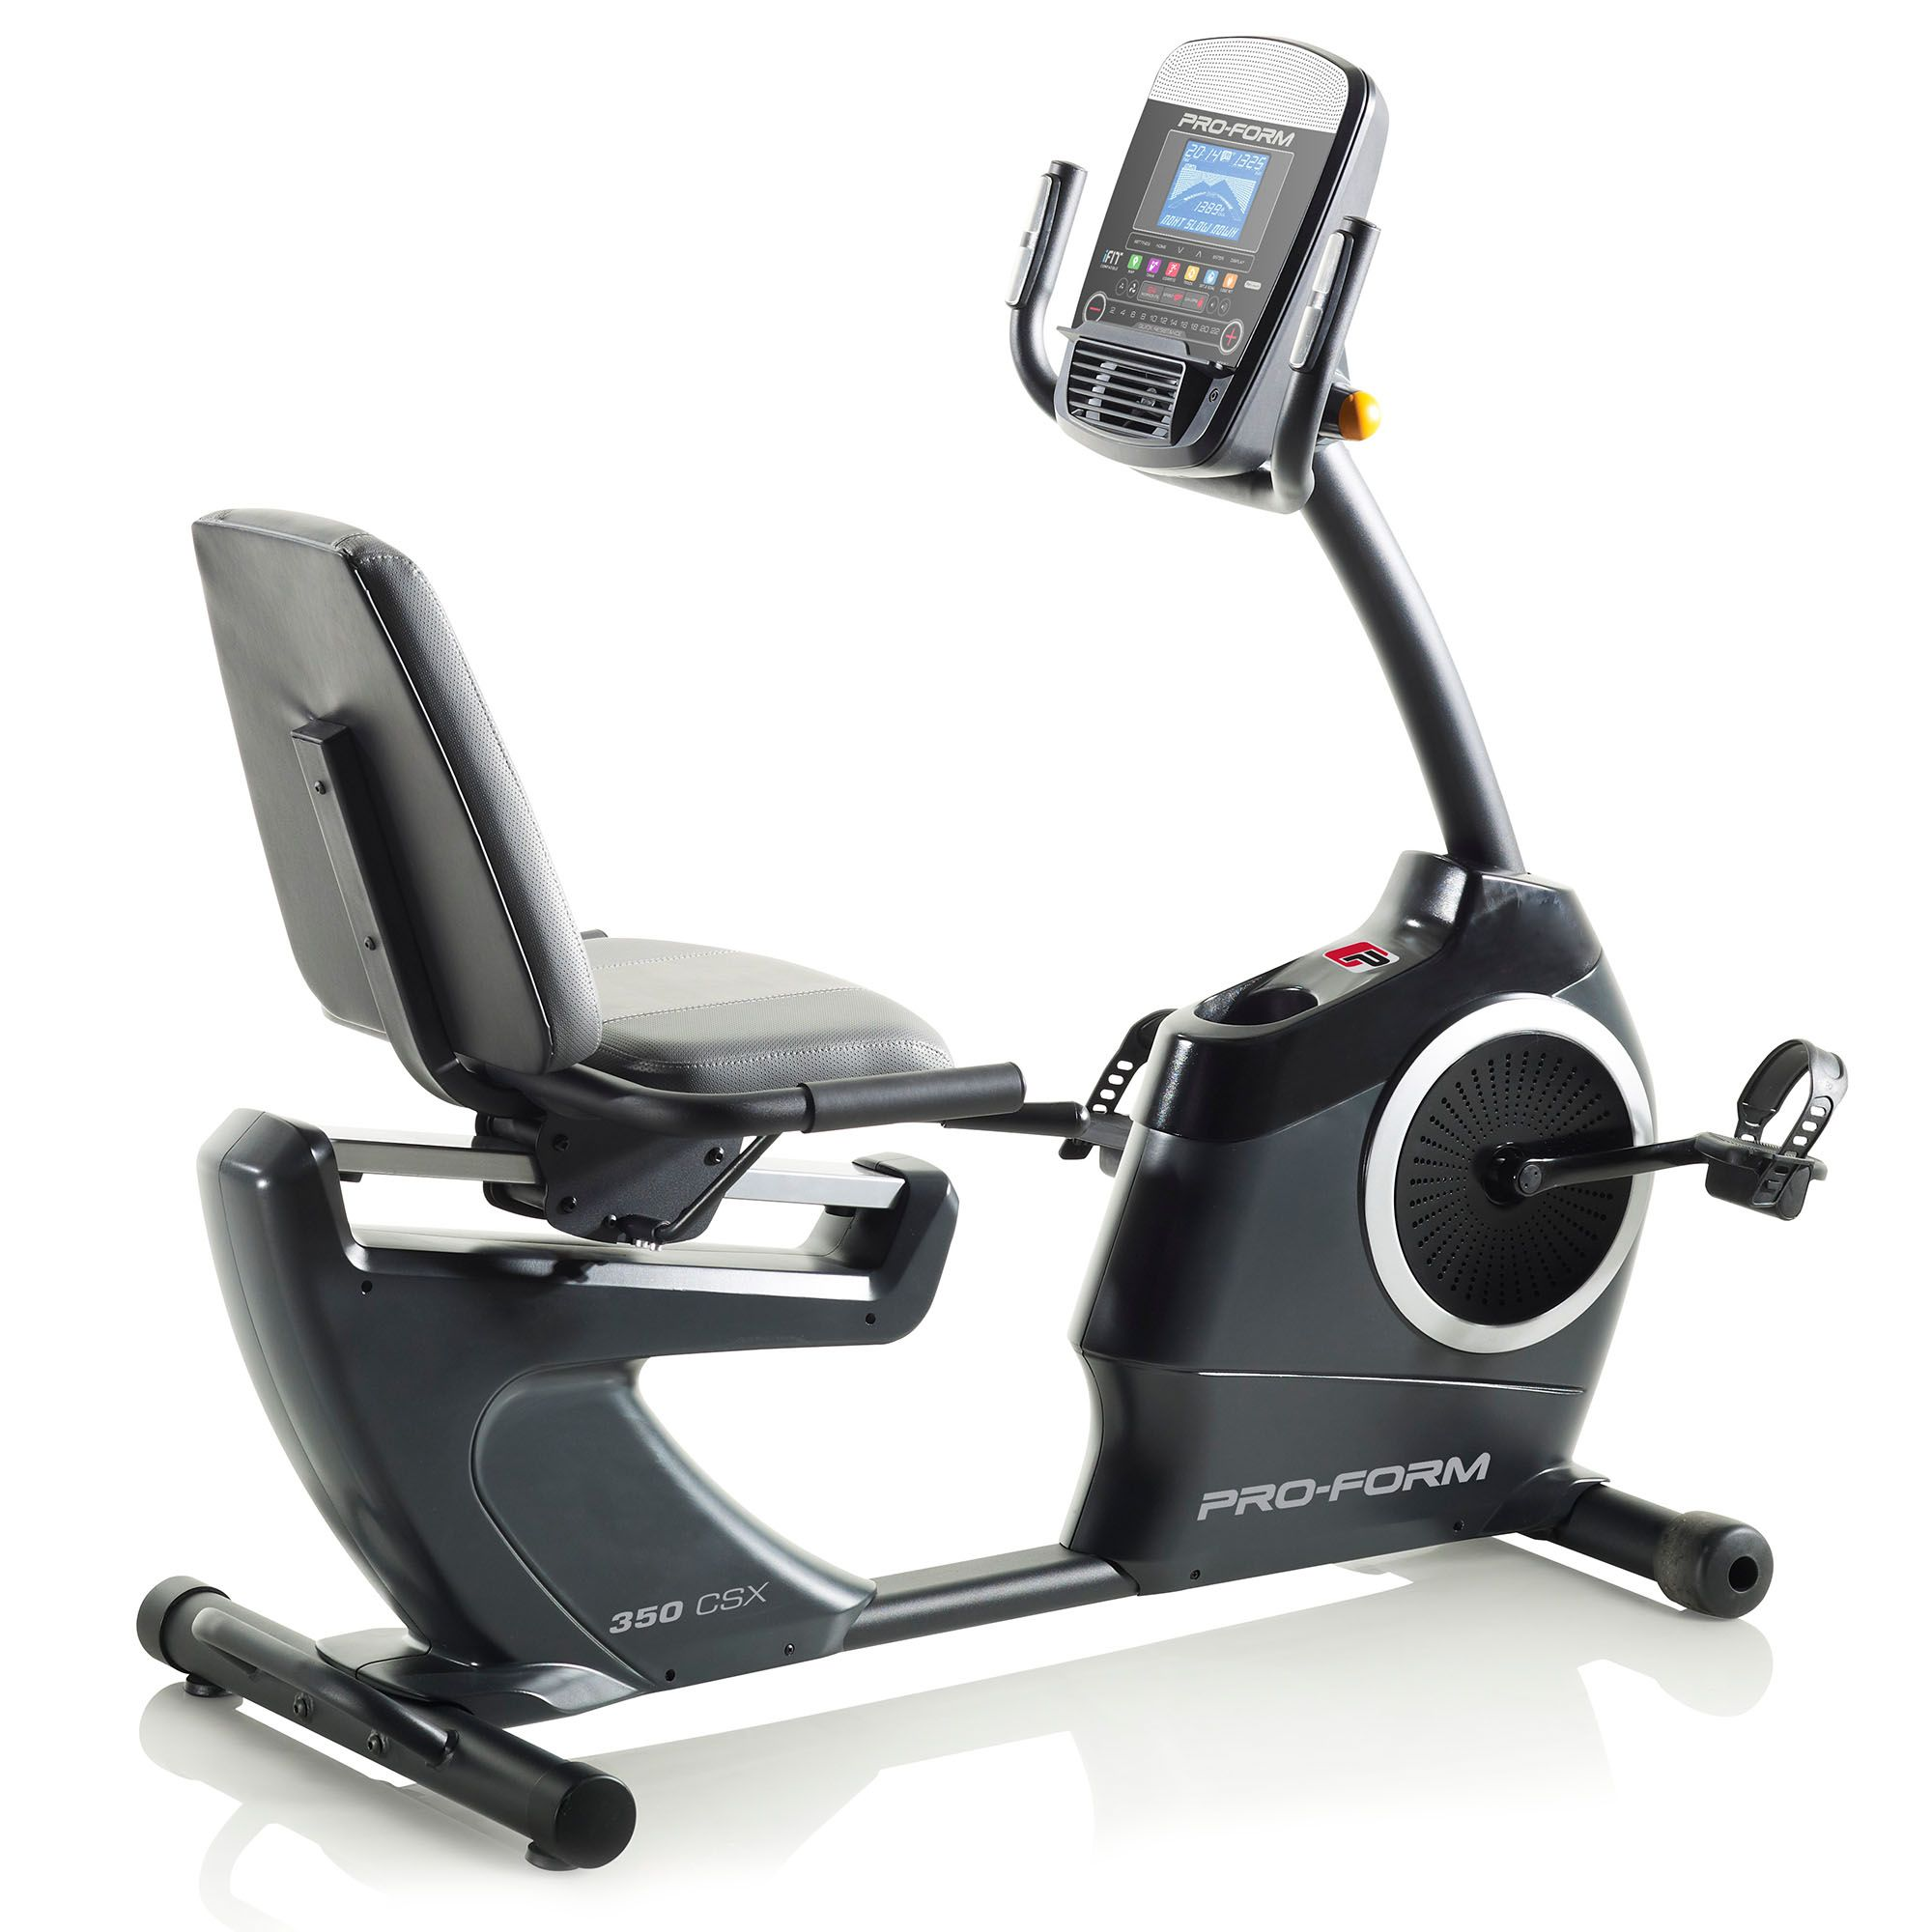 proform 350 csx recumbent exercise bike. Black Bedroom Furniture Sets. Home Design Ideas